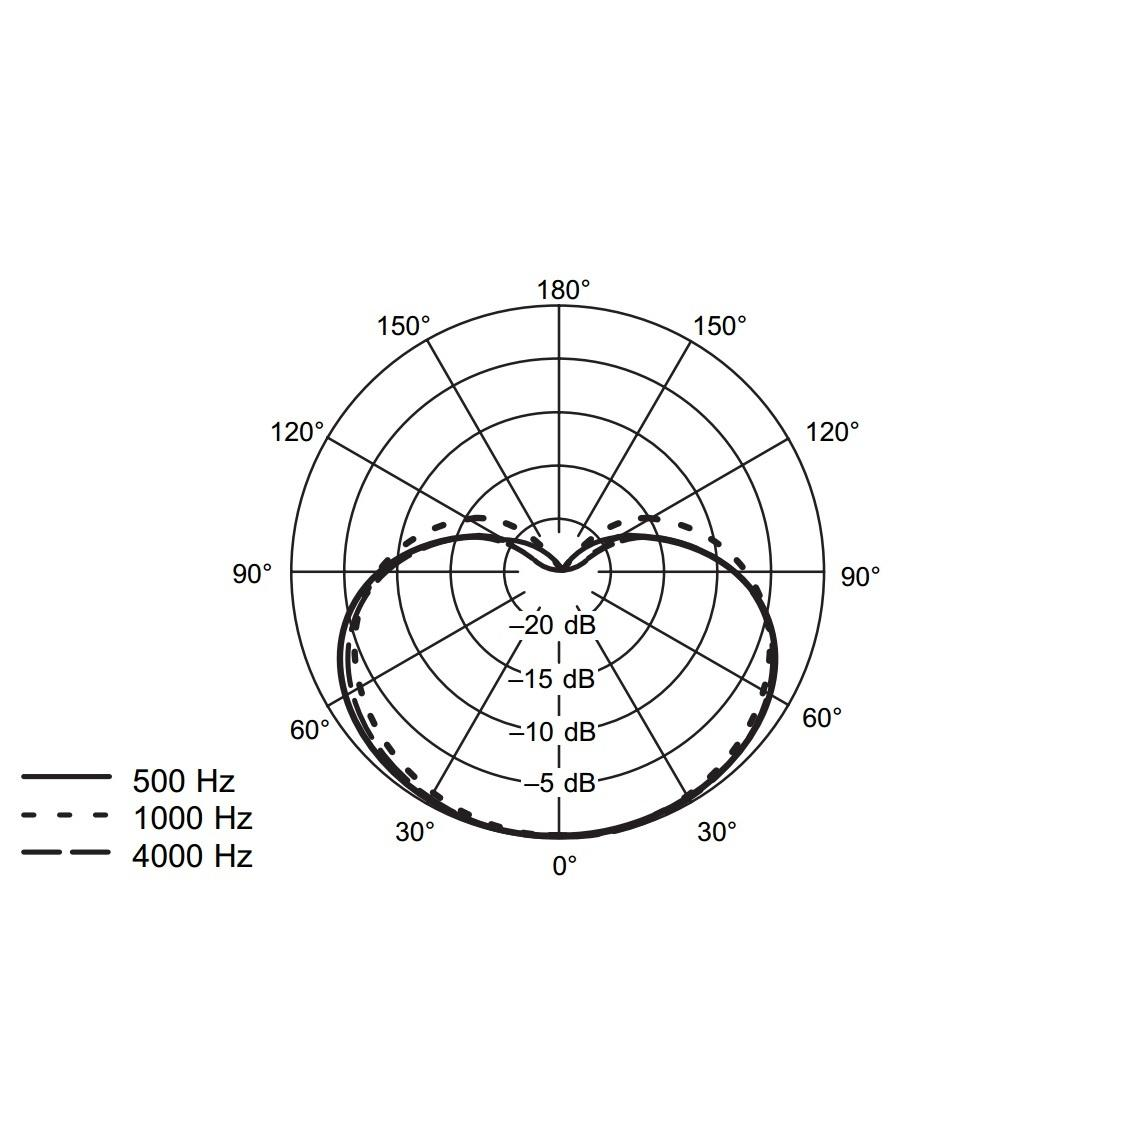 xlr connector wiring diagram view diagram